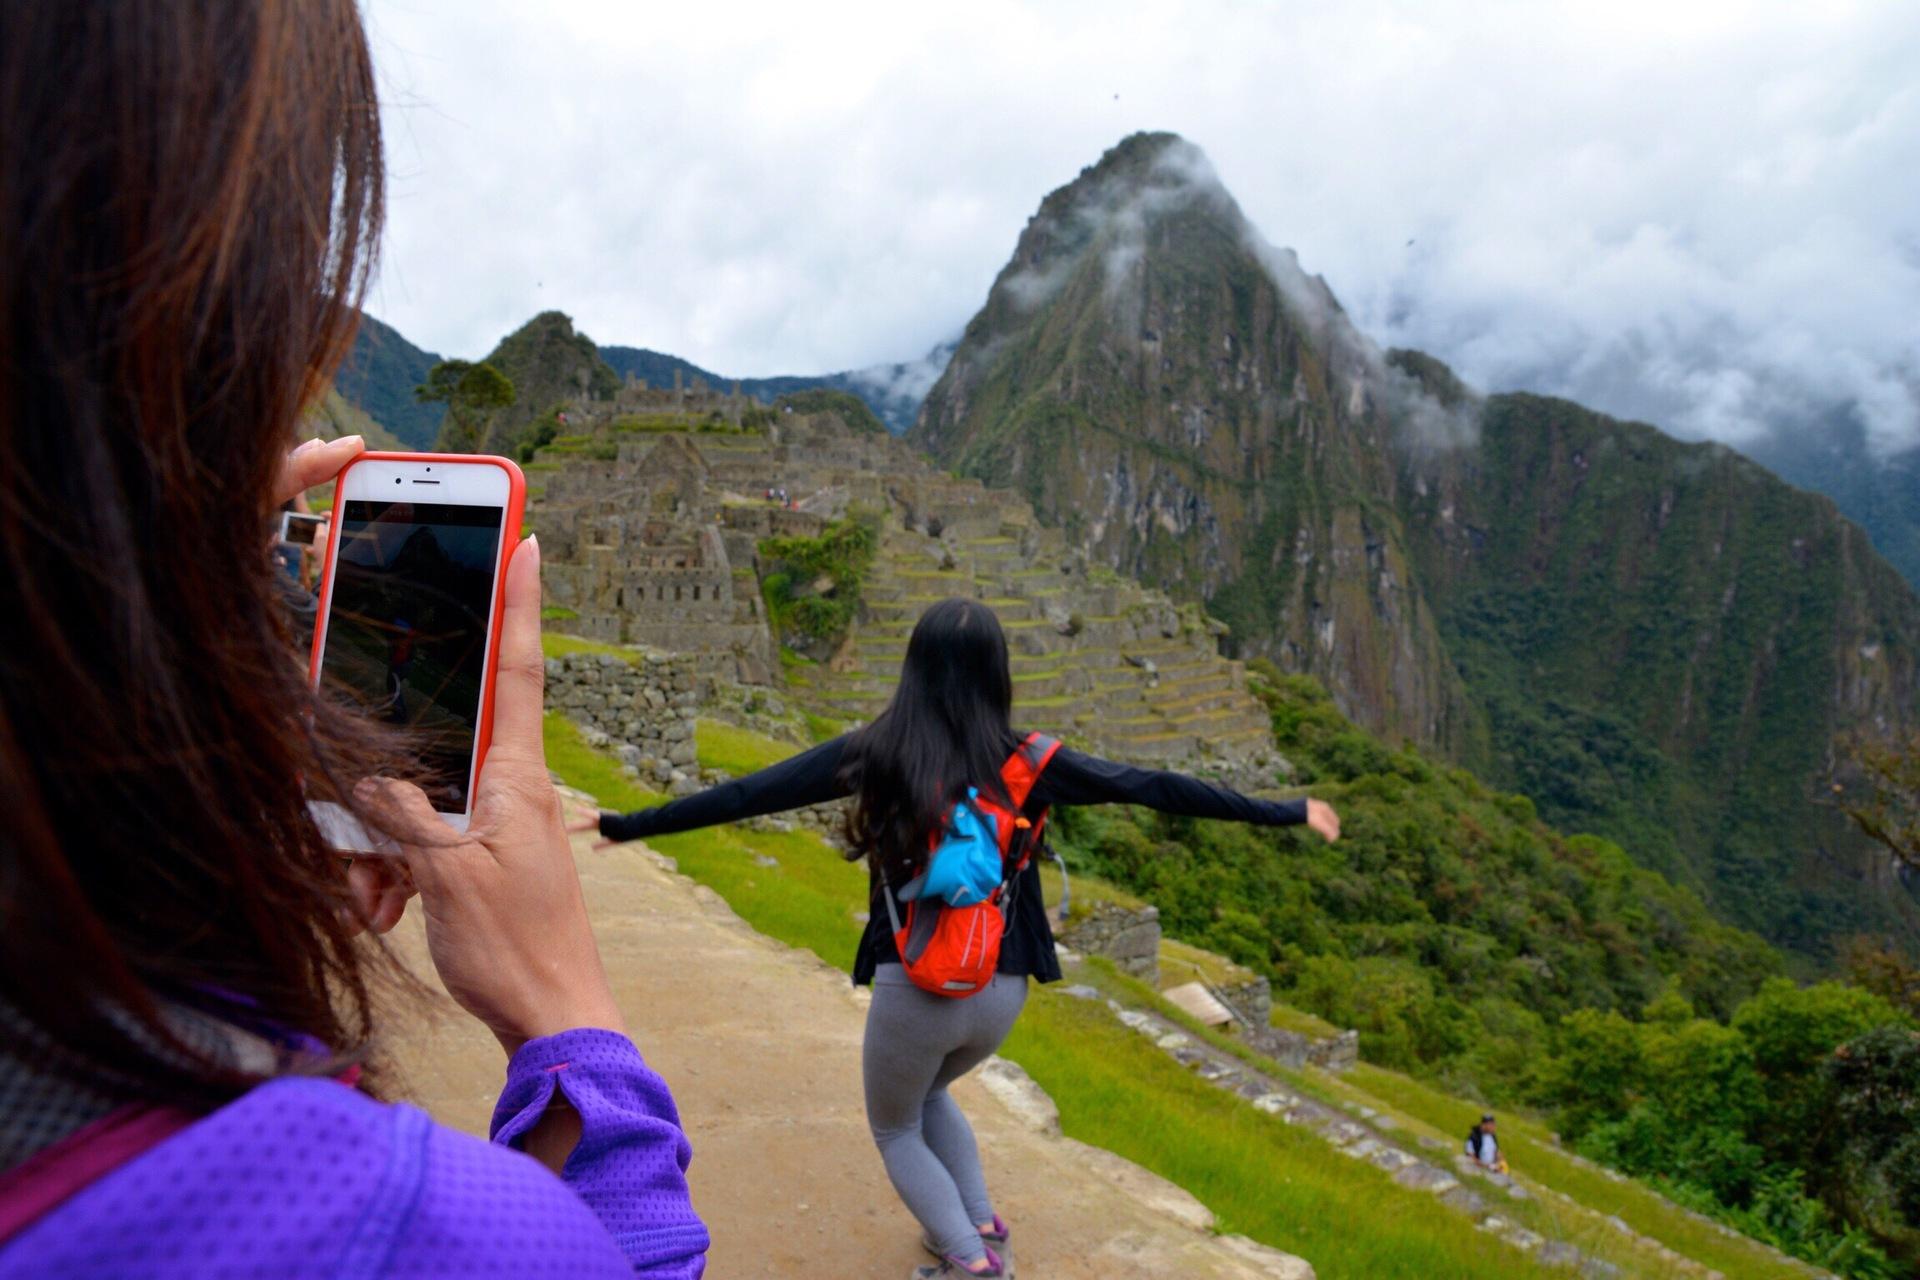 Photography at Machu Picchu   mbocast, adult, daytime, hiker